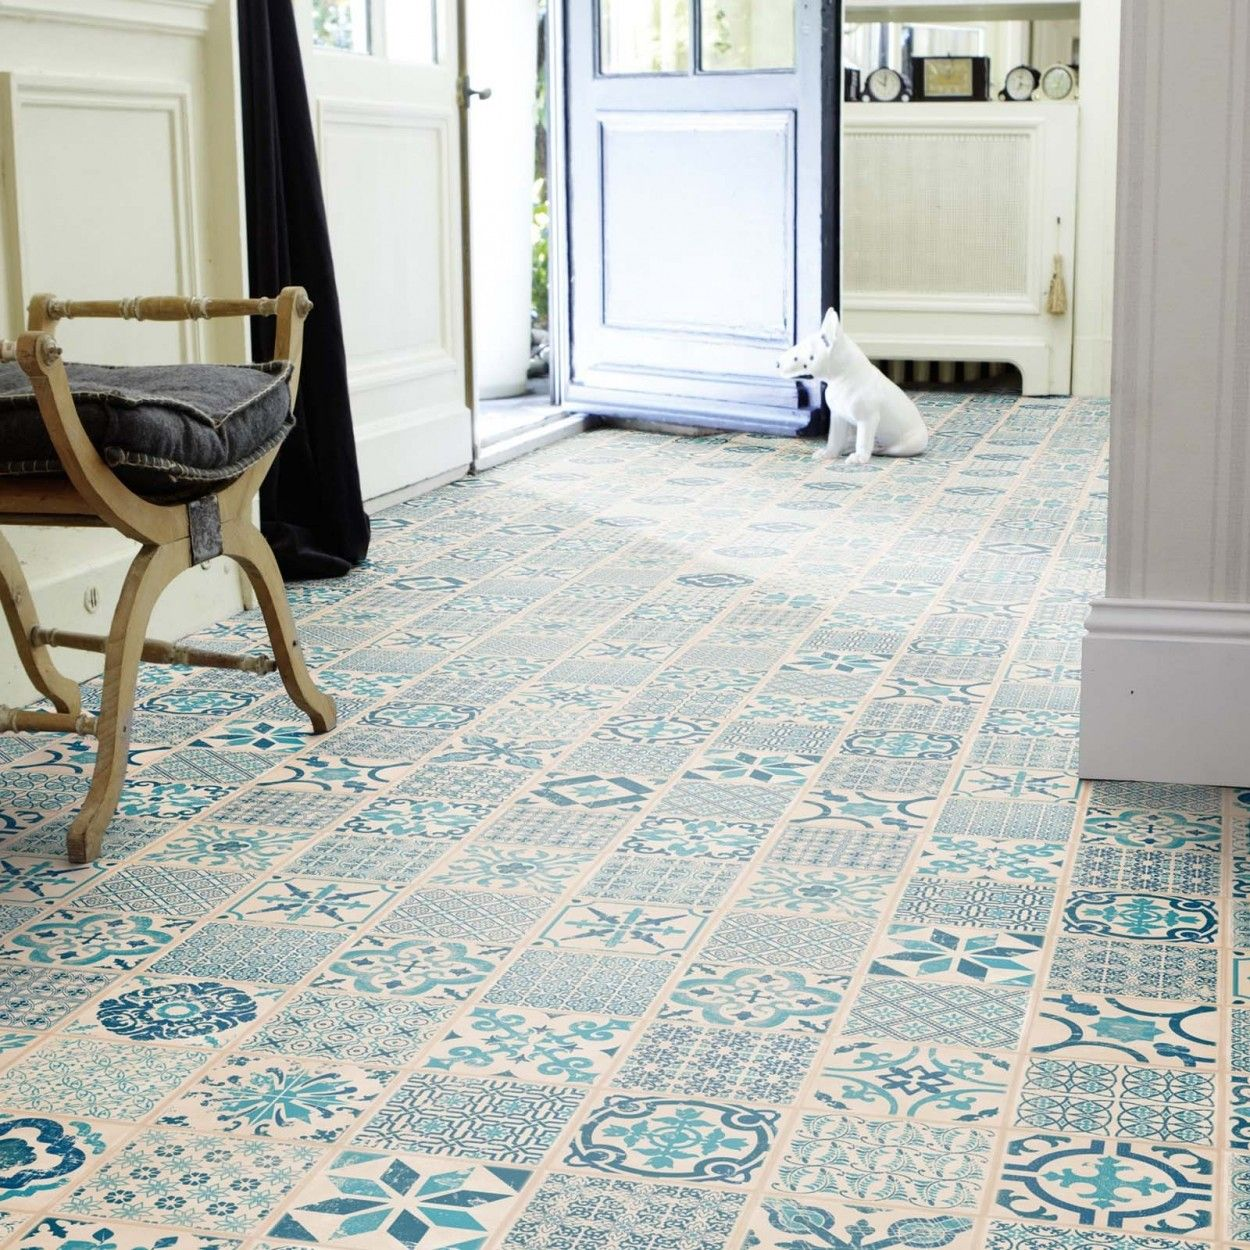 Tarkett Starfloor Click 30 Retro Indigo Kup Teraz Panele Winylowe Click In 2020 Stylish Flooring Vinyl Flooring Interior Tiles